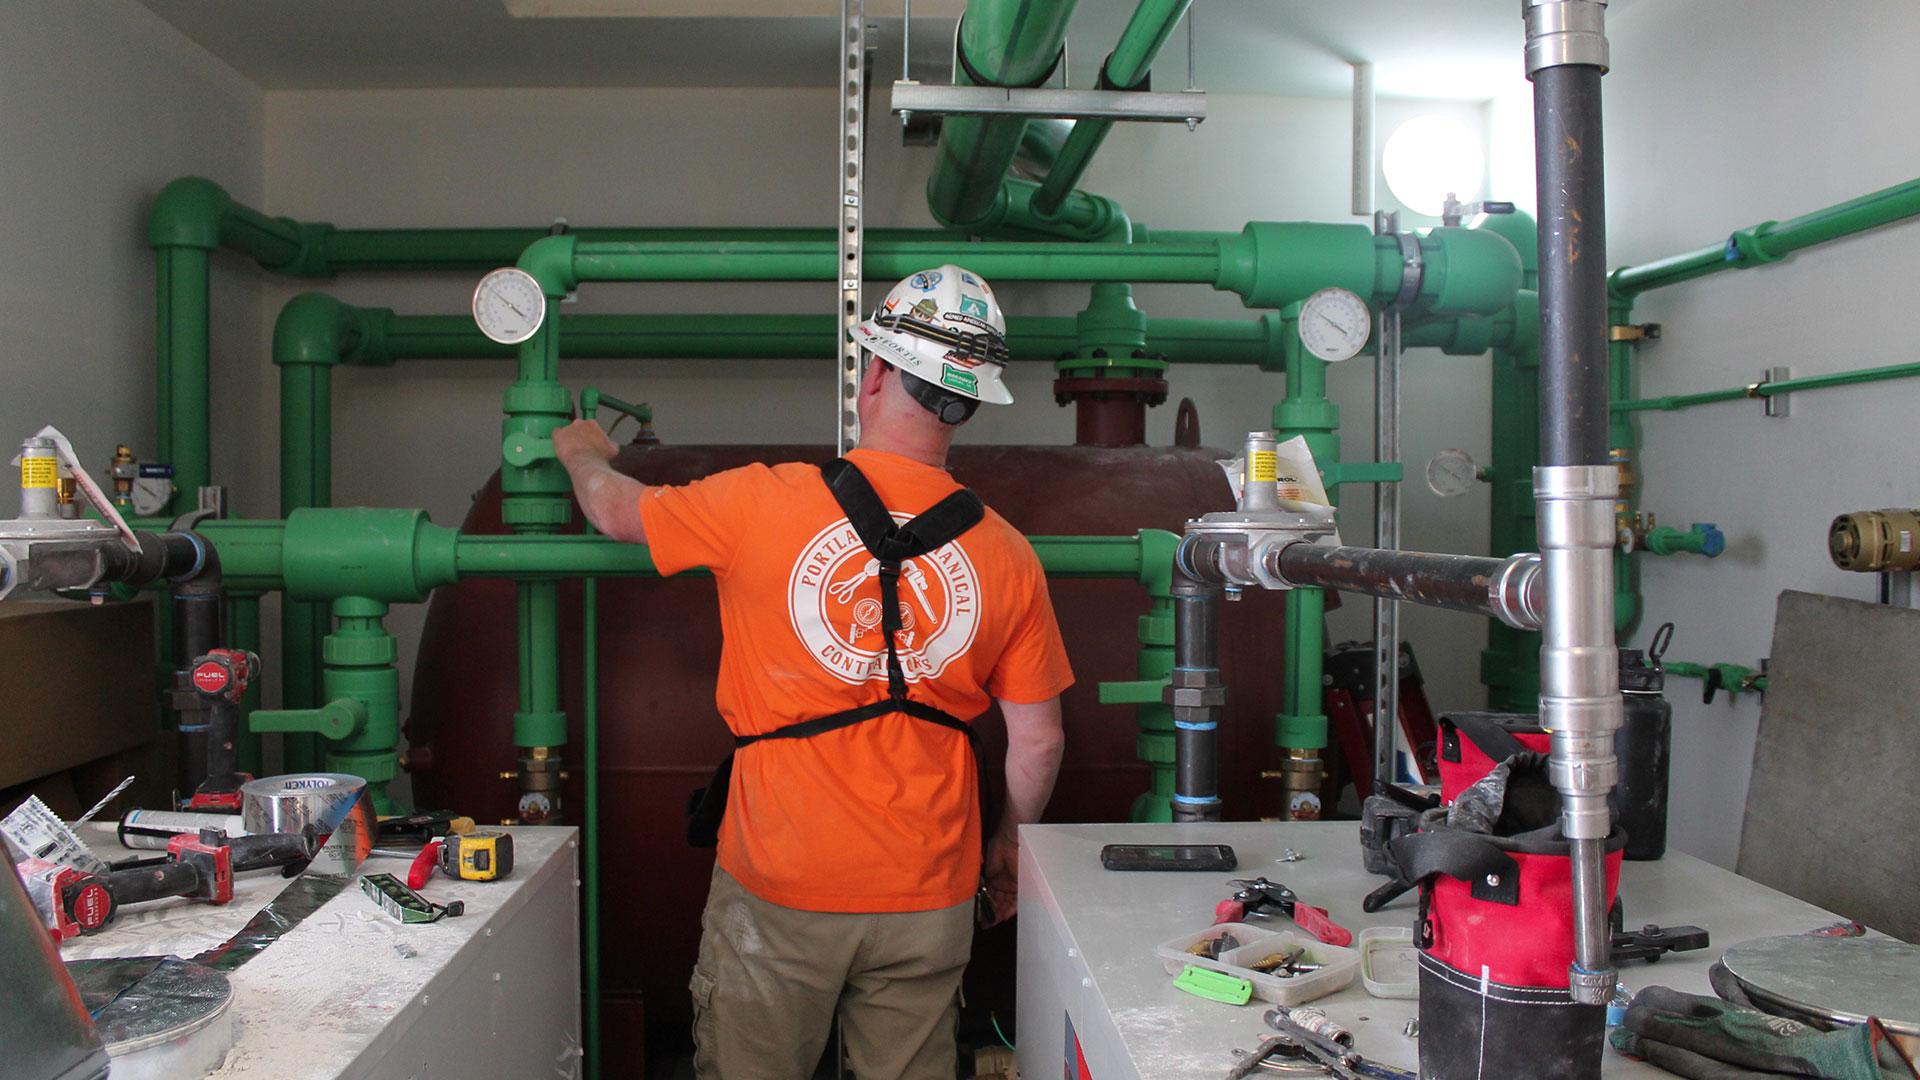 Employee in hard hat inspecting plumbing